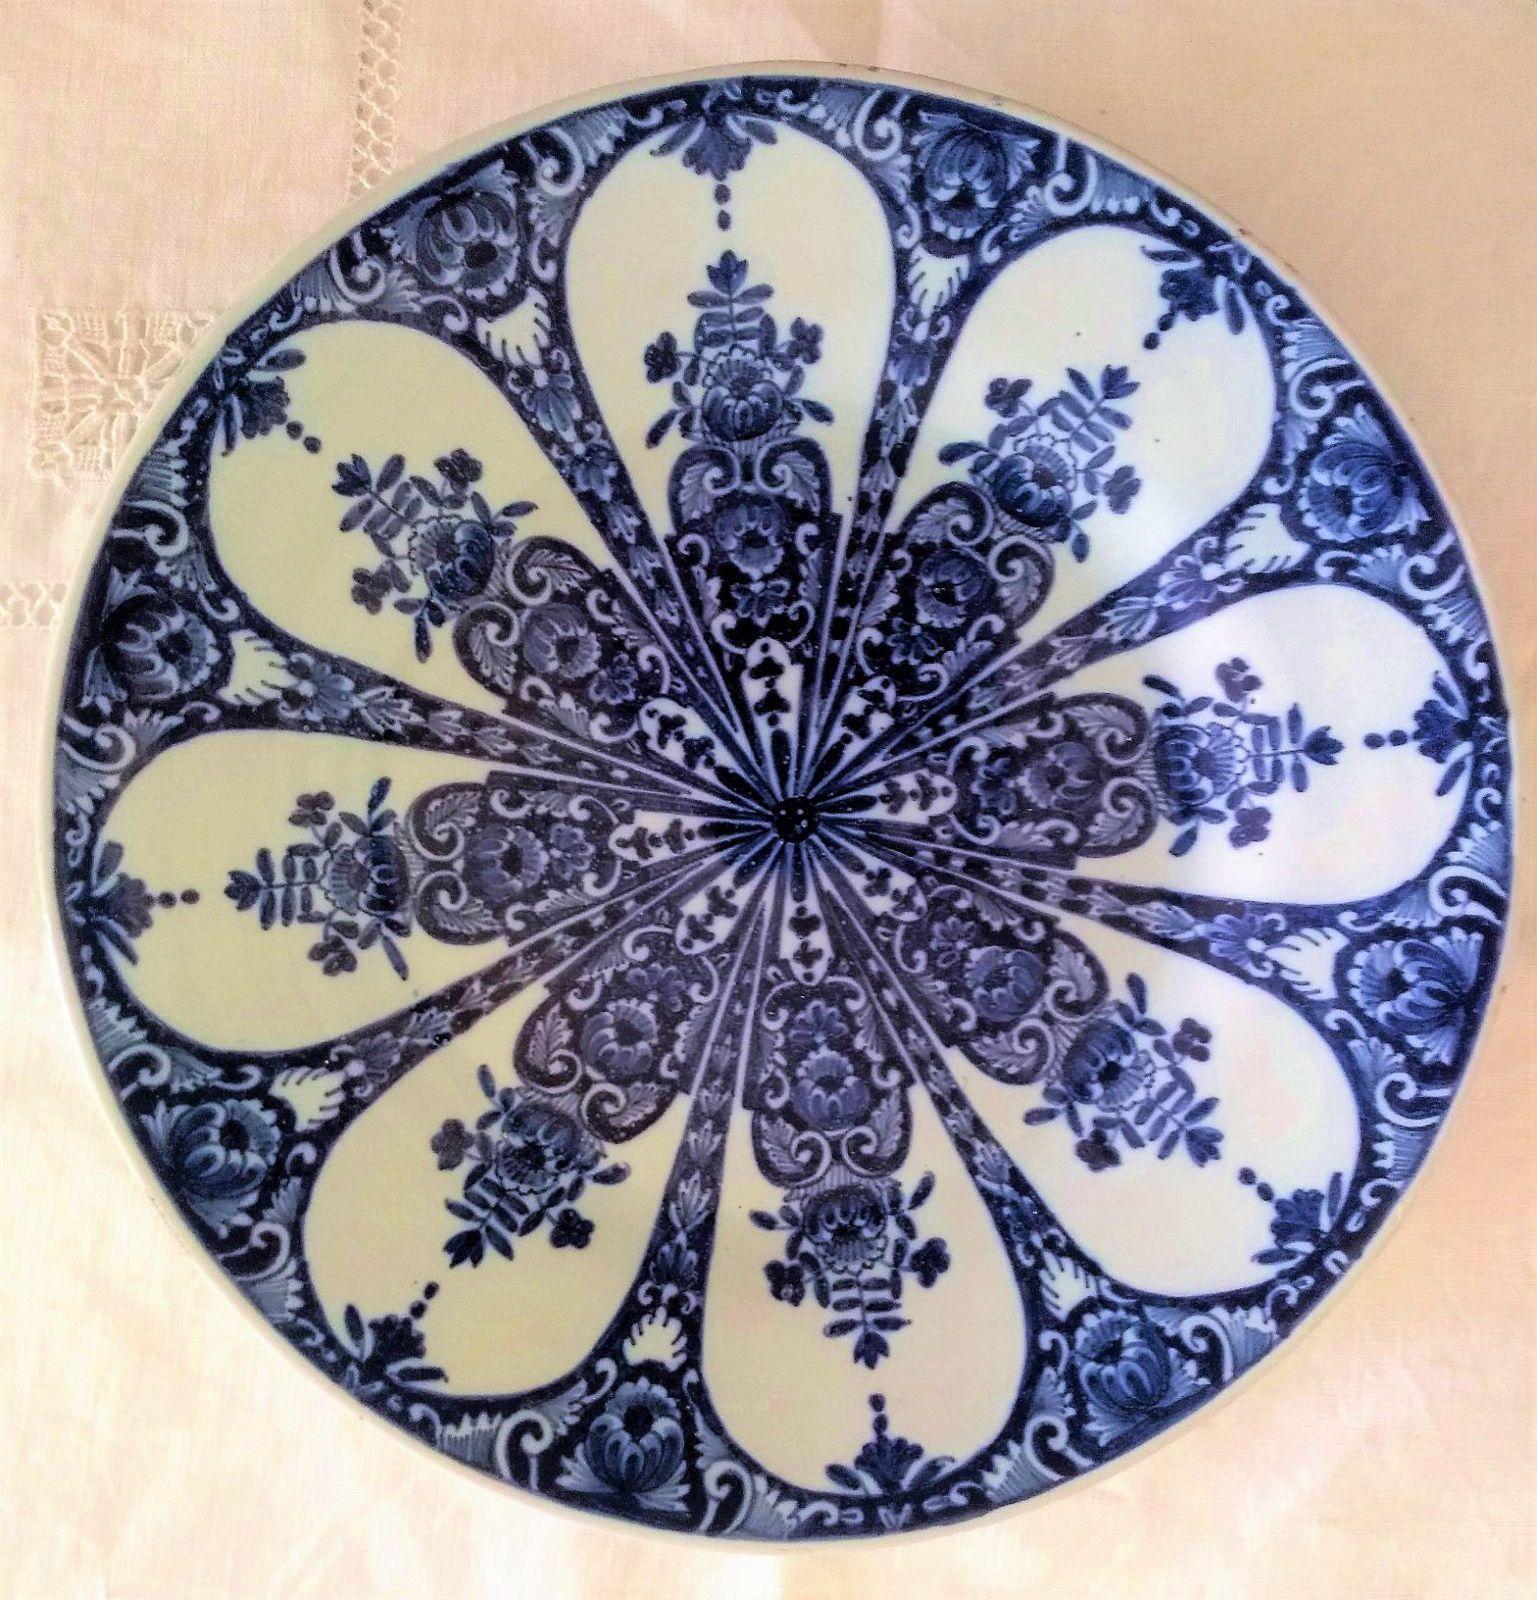 Assiette de Rouen faïence décor en camaïeu bleu XVIII / XIXème